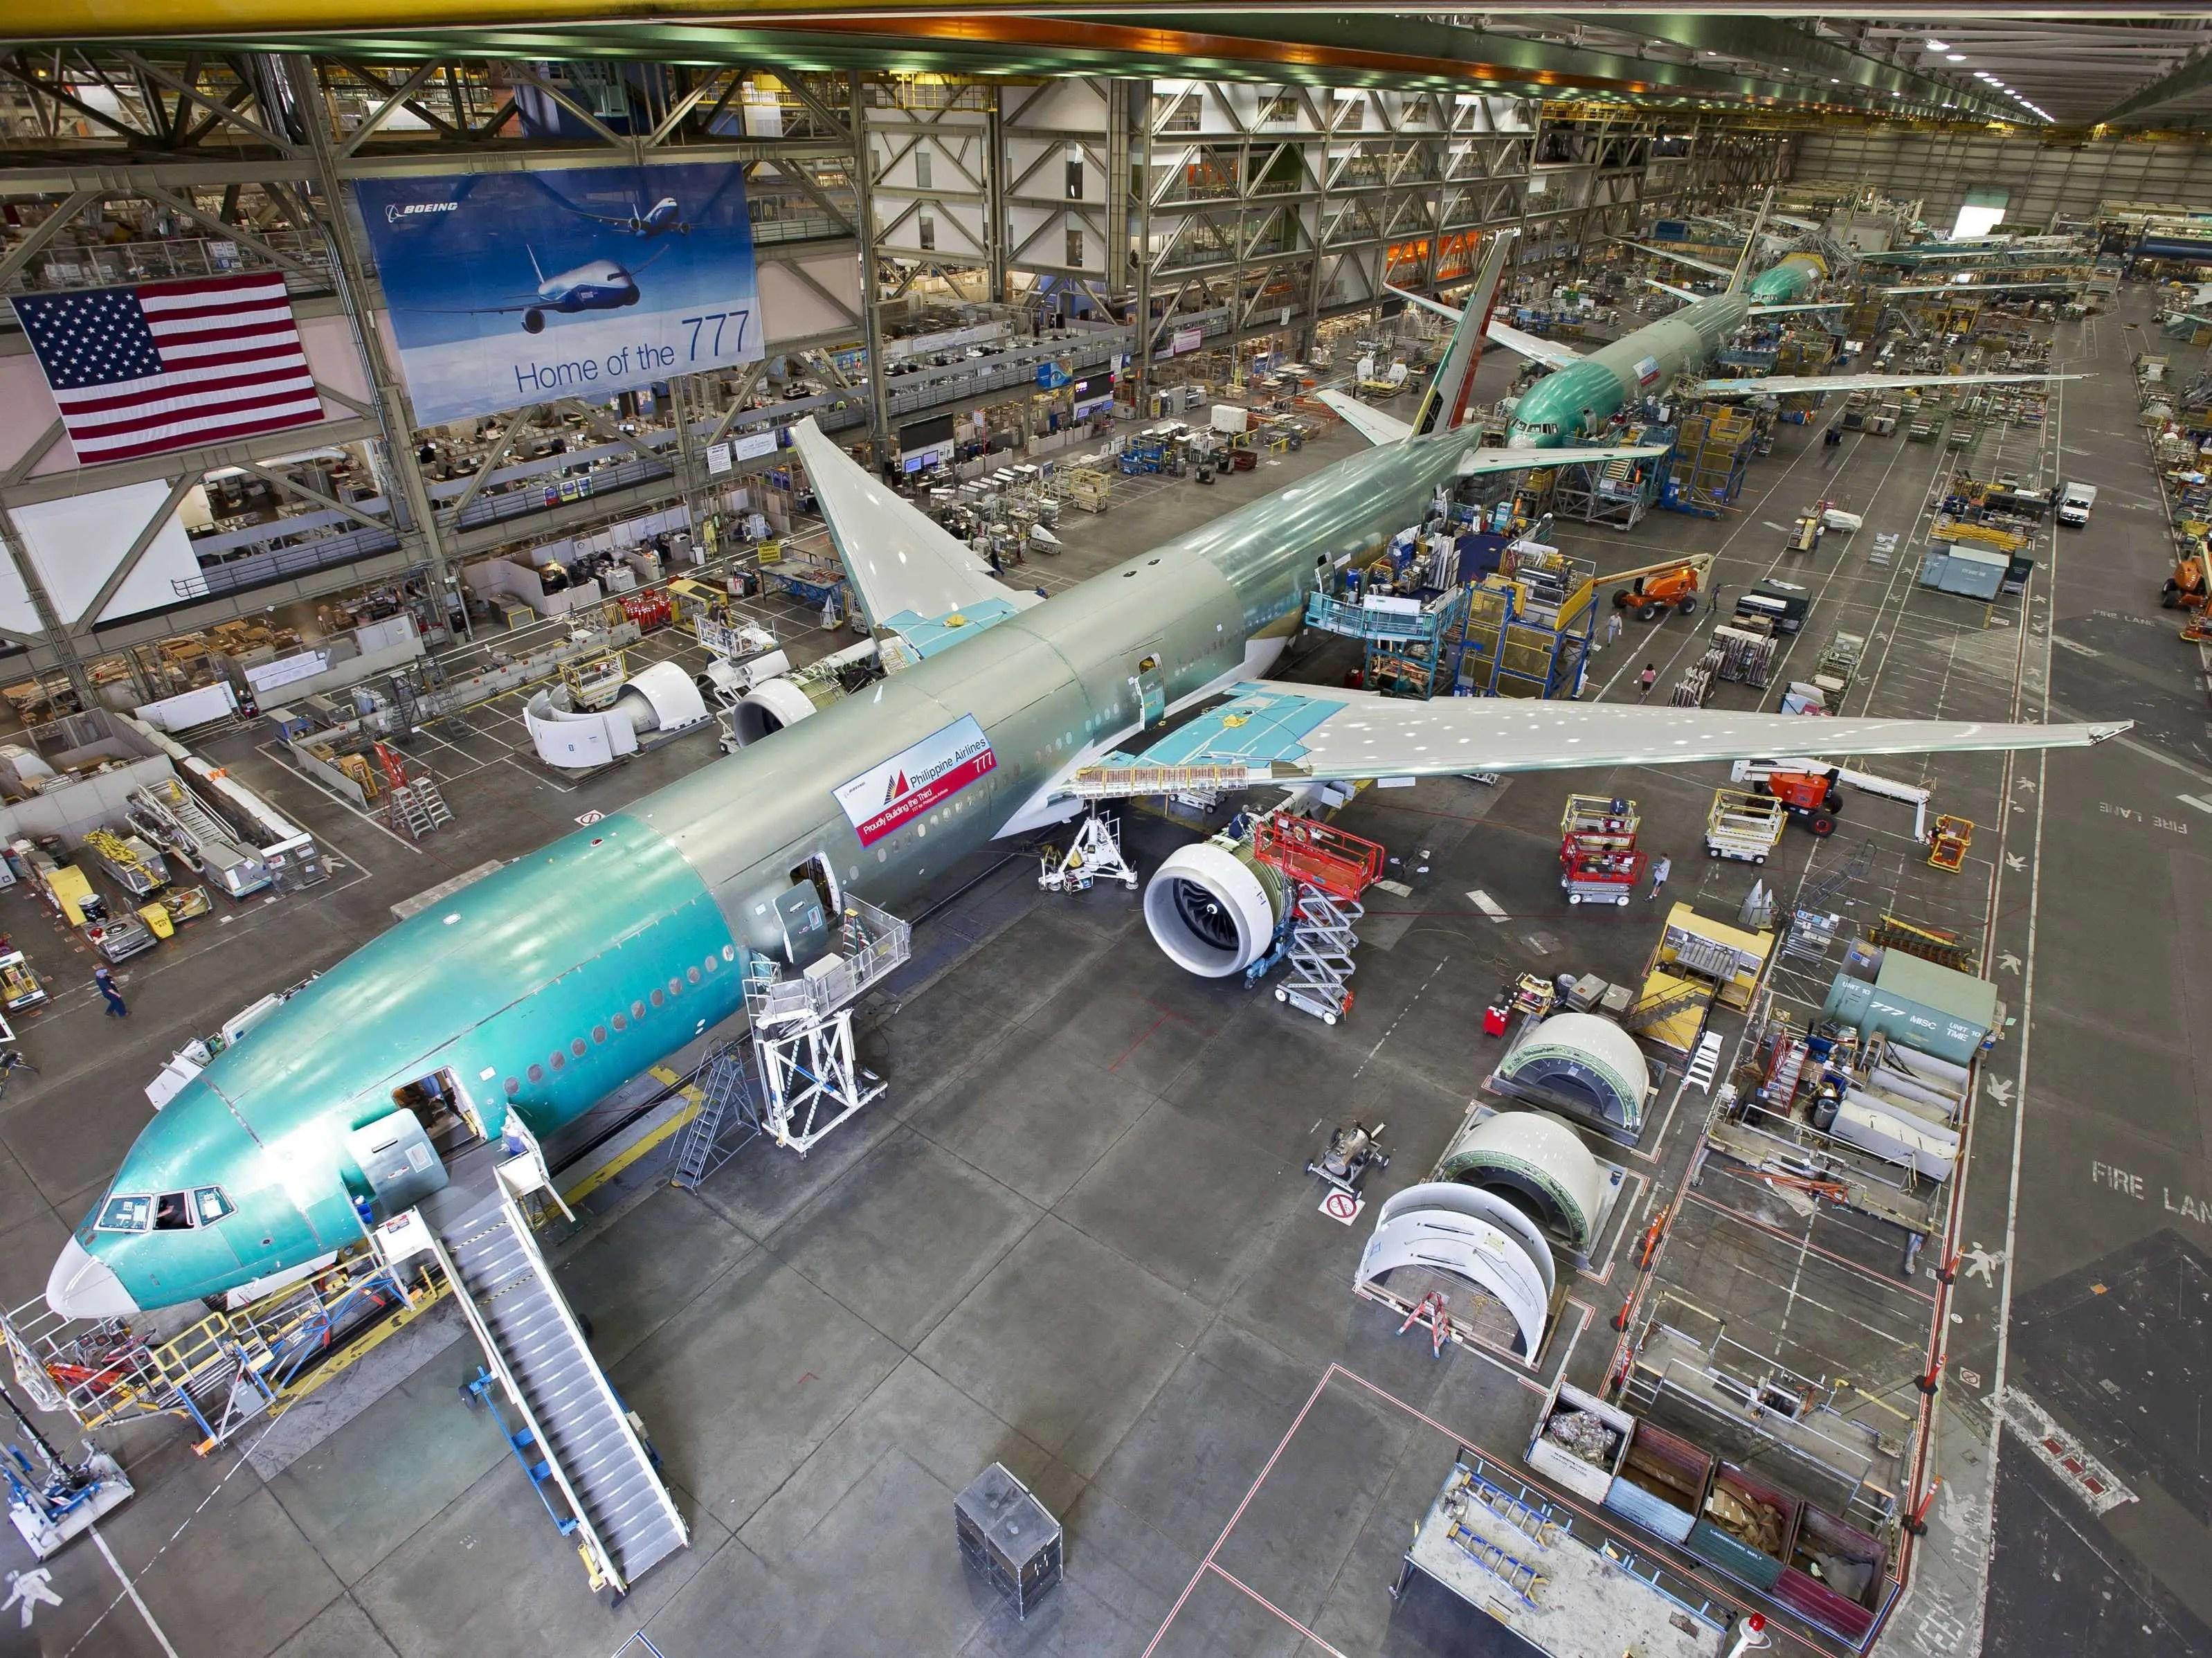 https://i2.wp.com/static5.businessinsider.com/image/50896e4eeab8eaa718000003-2400/boeing-777-production-assembly-factory-3.jpg